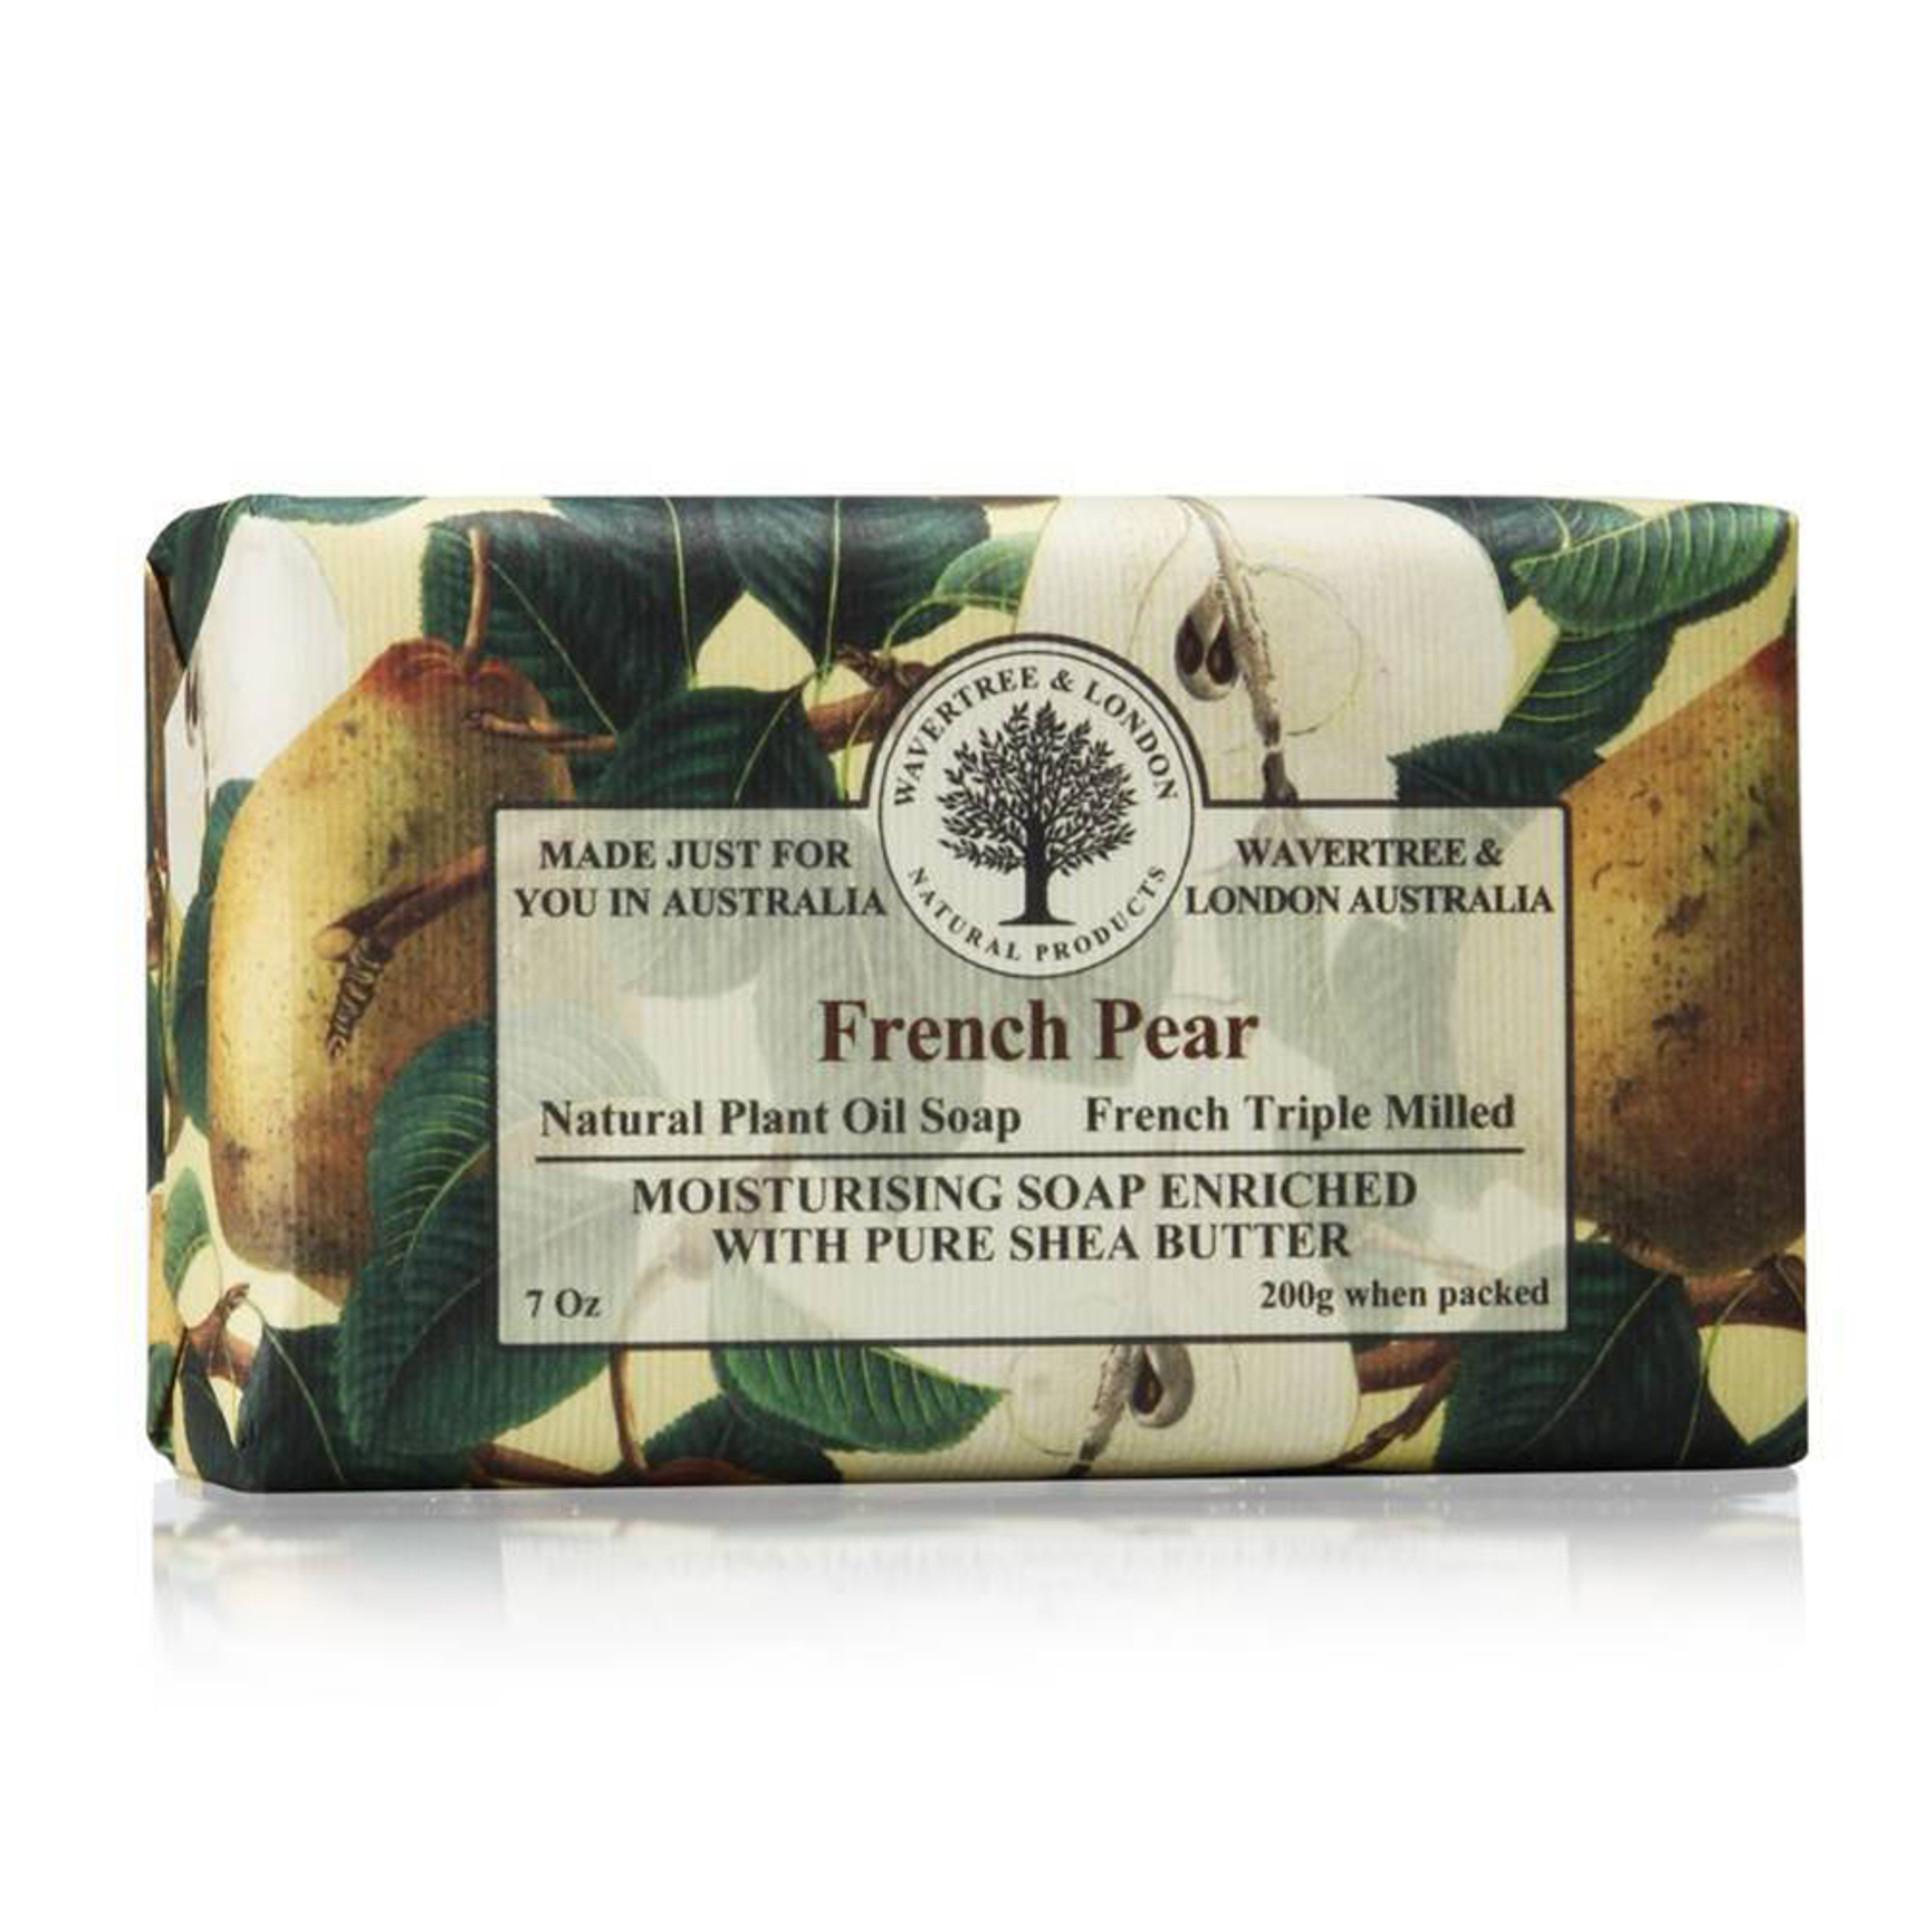 Wavetree & London Australia French Pear Bar Soap